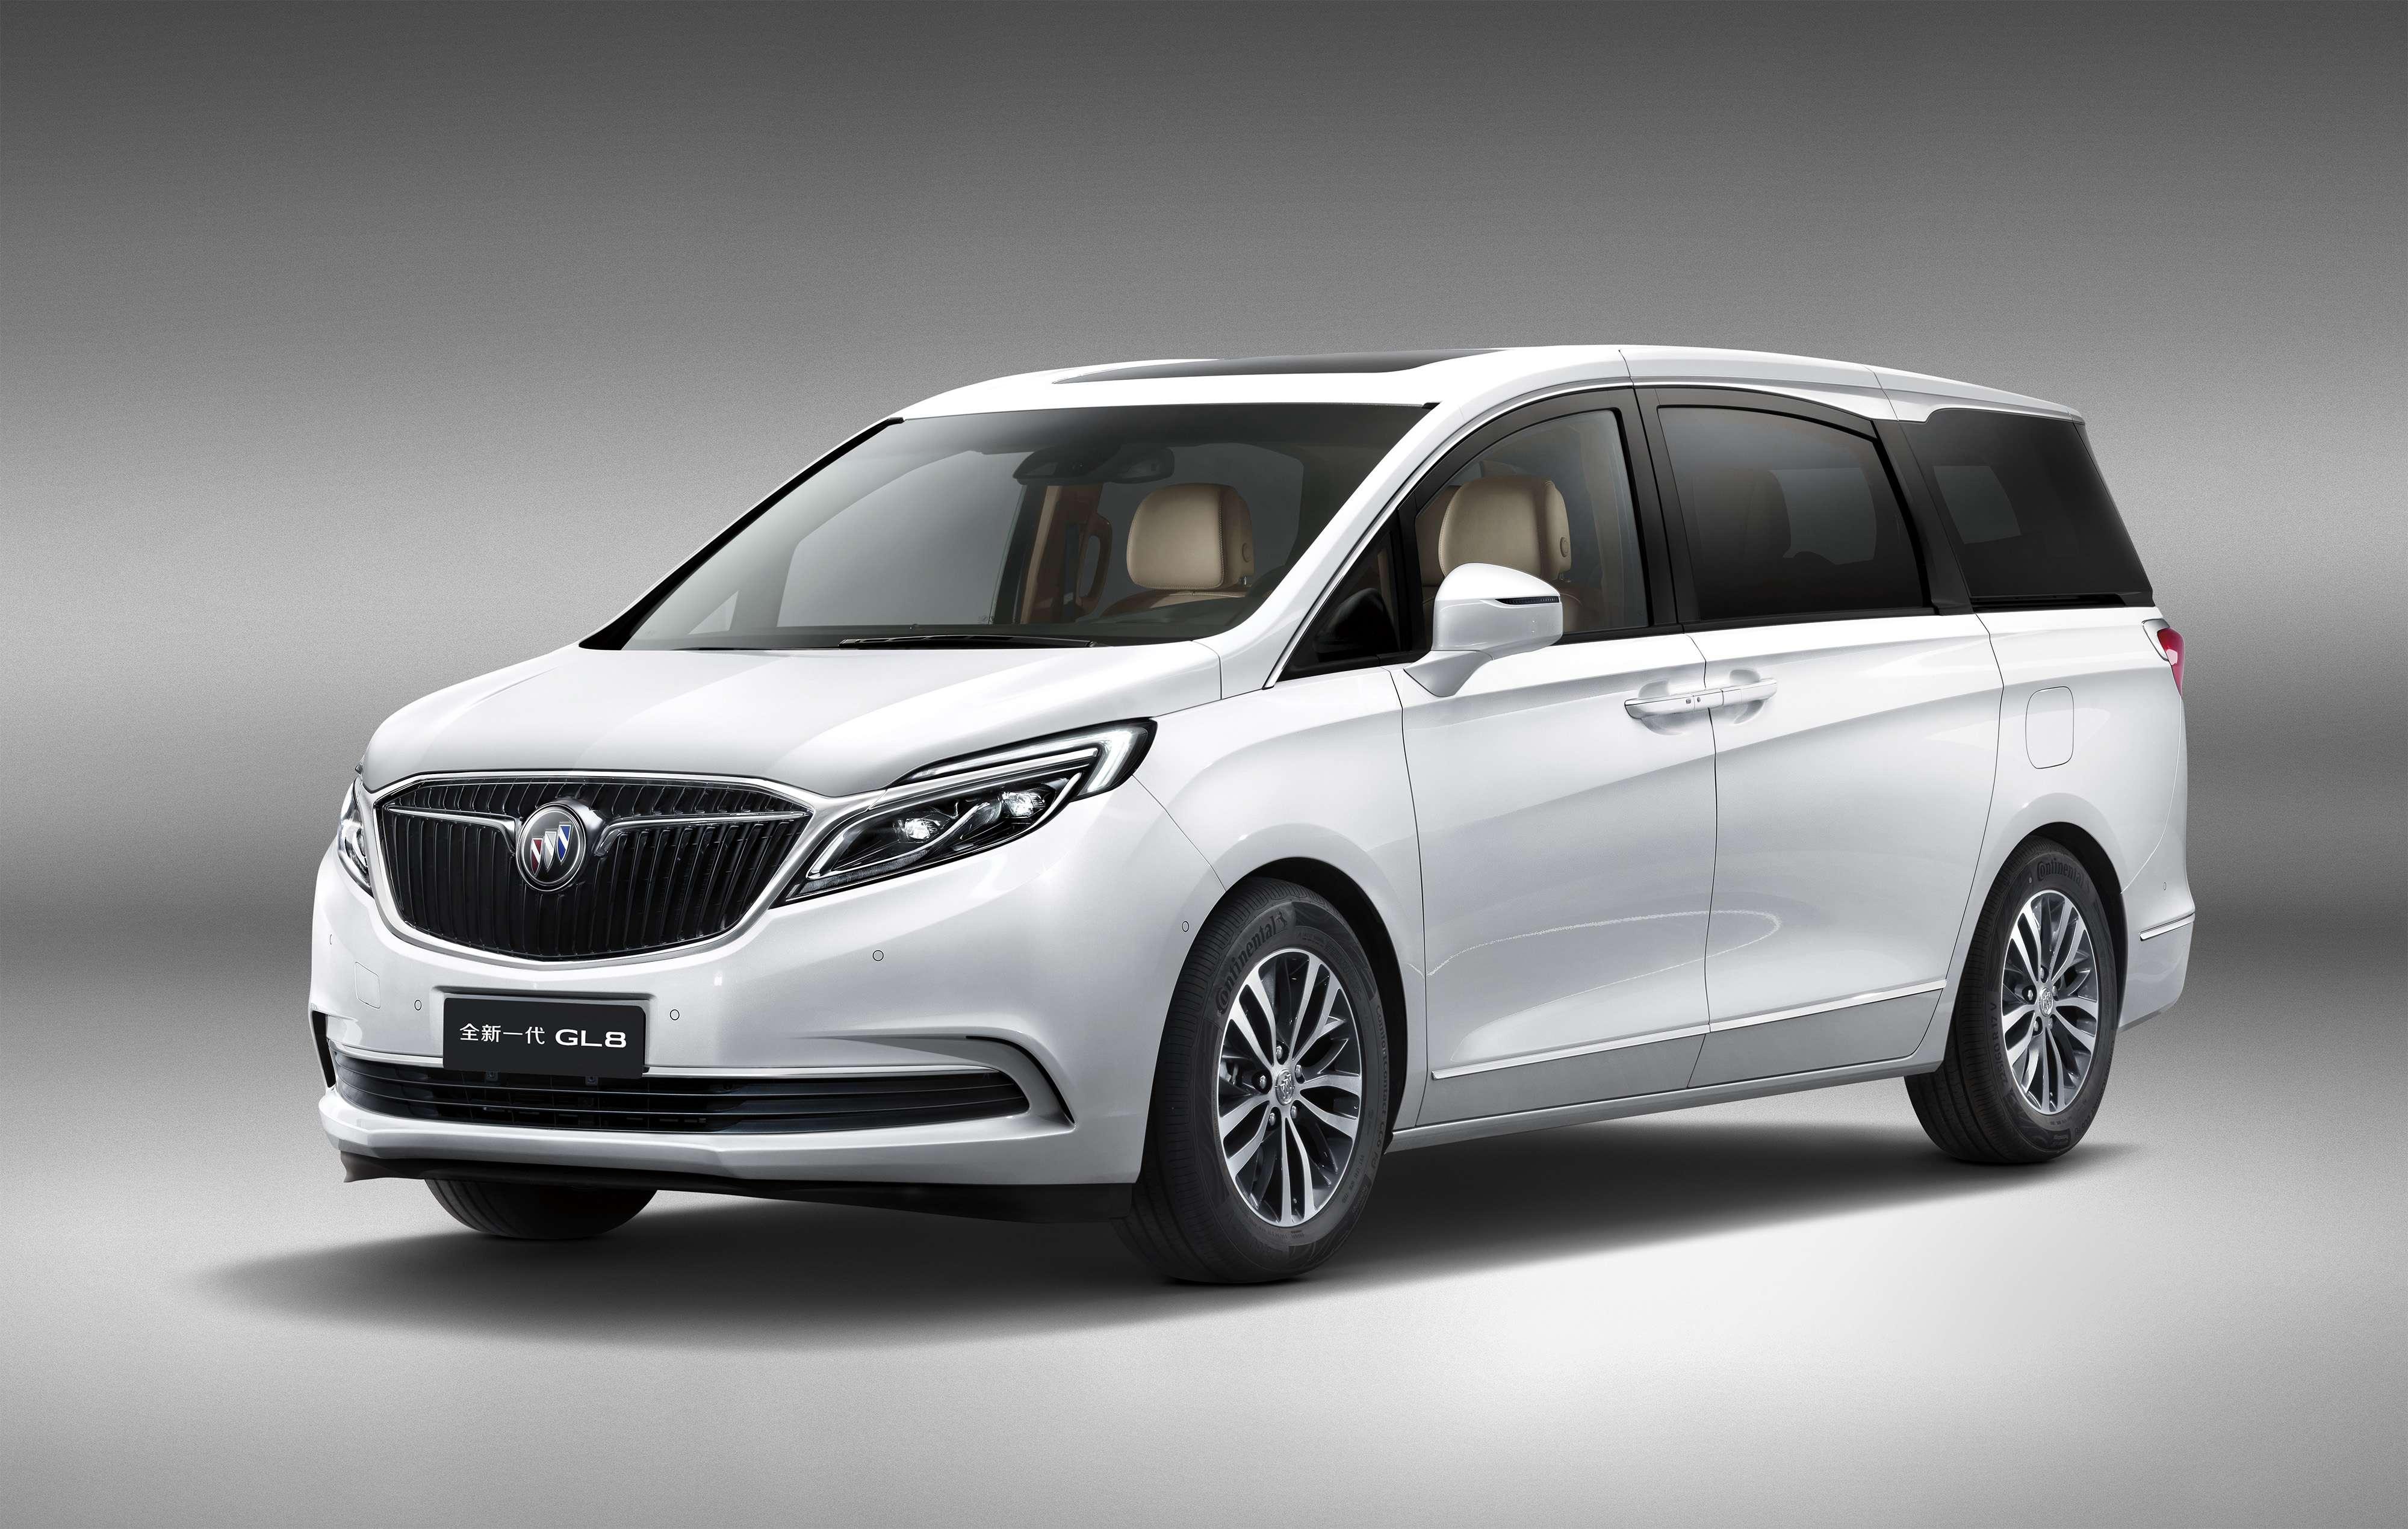 fleet group companies of gmc our minivan citylink